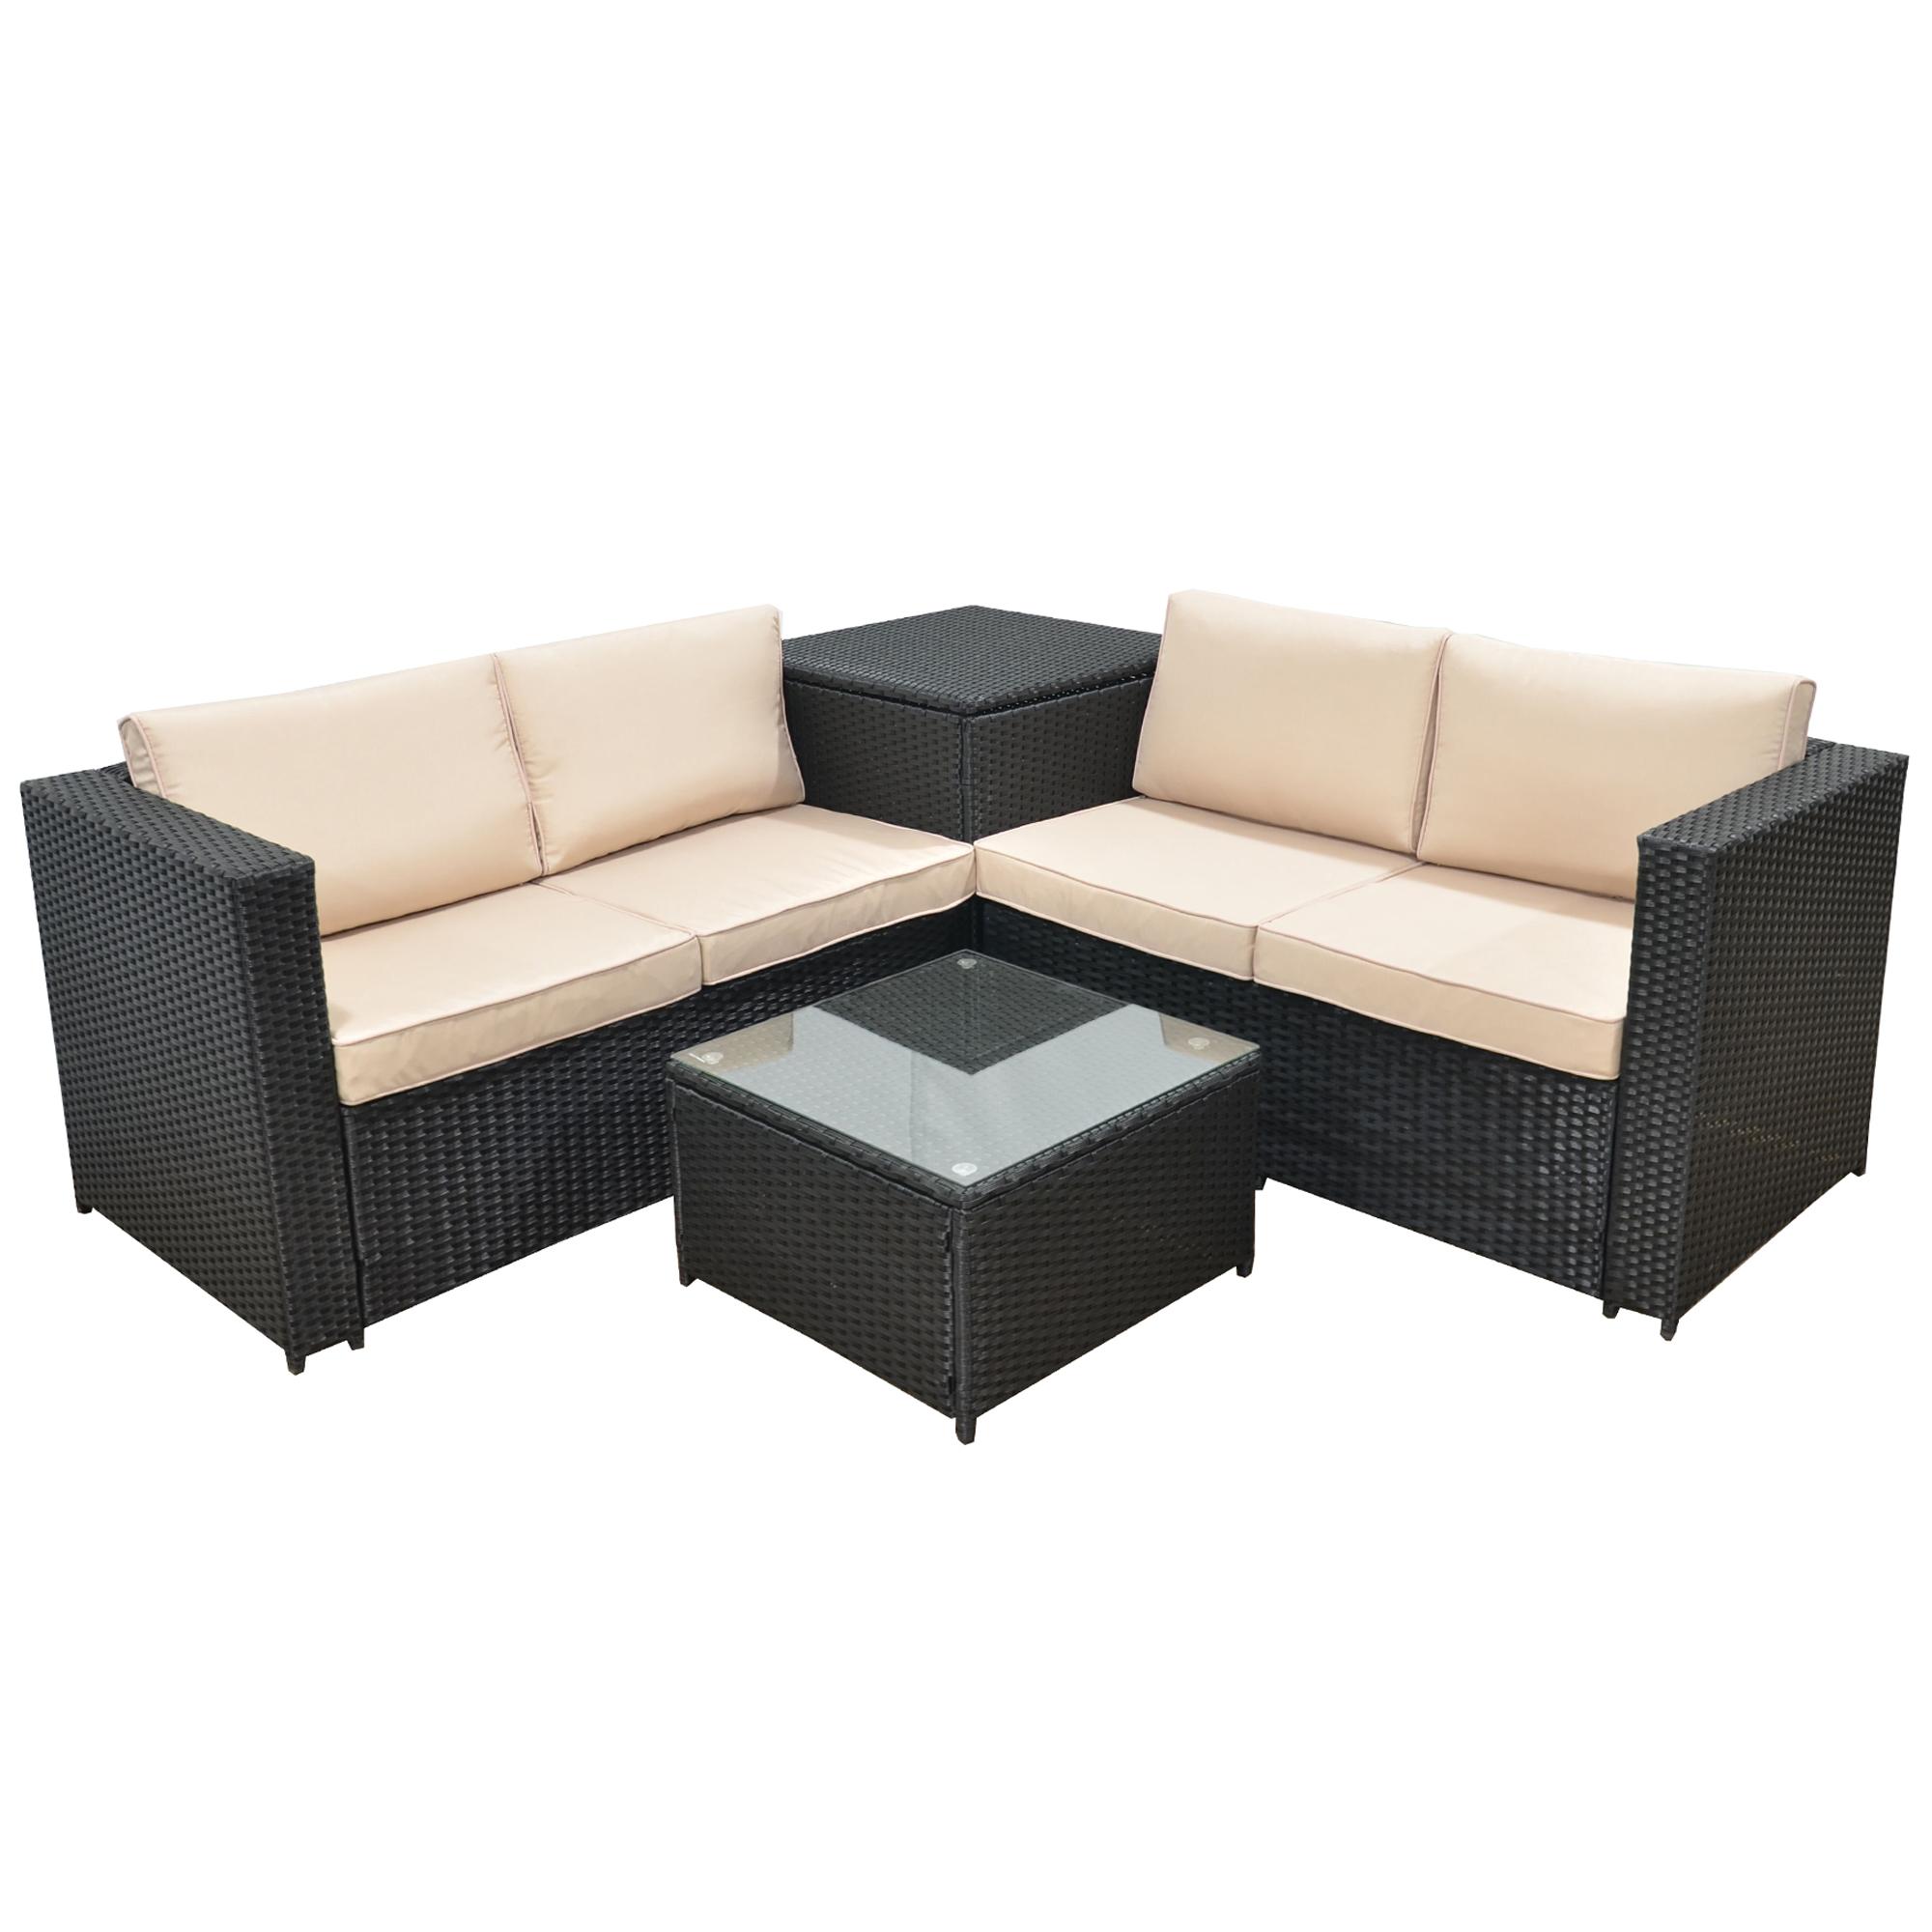 Jalano poly rattan lounge set sm1 gartenm bel for Rattan garten lounge gunstig